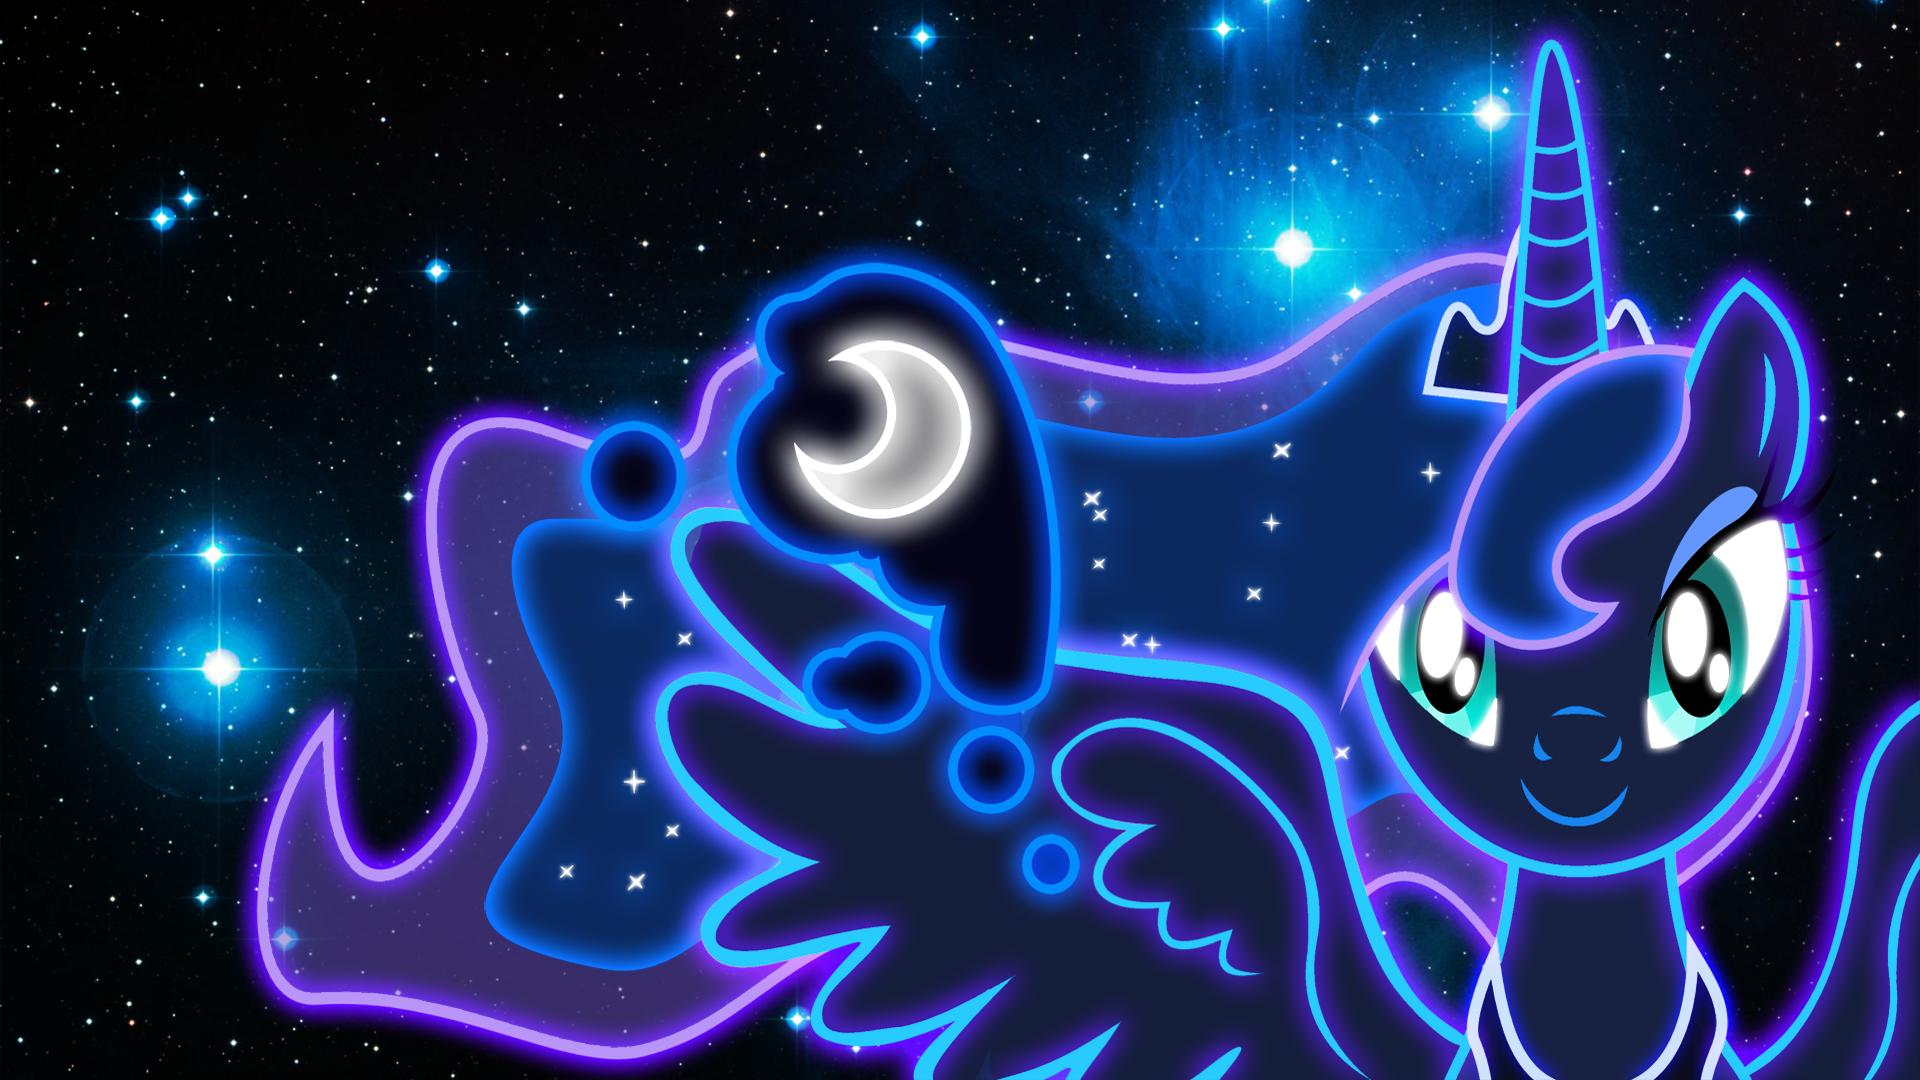 Neon Princess Luna Wallpaper By ZantyARZdeviantart On DeviantART